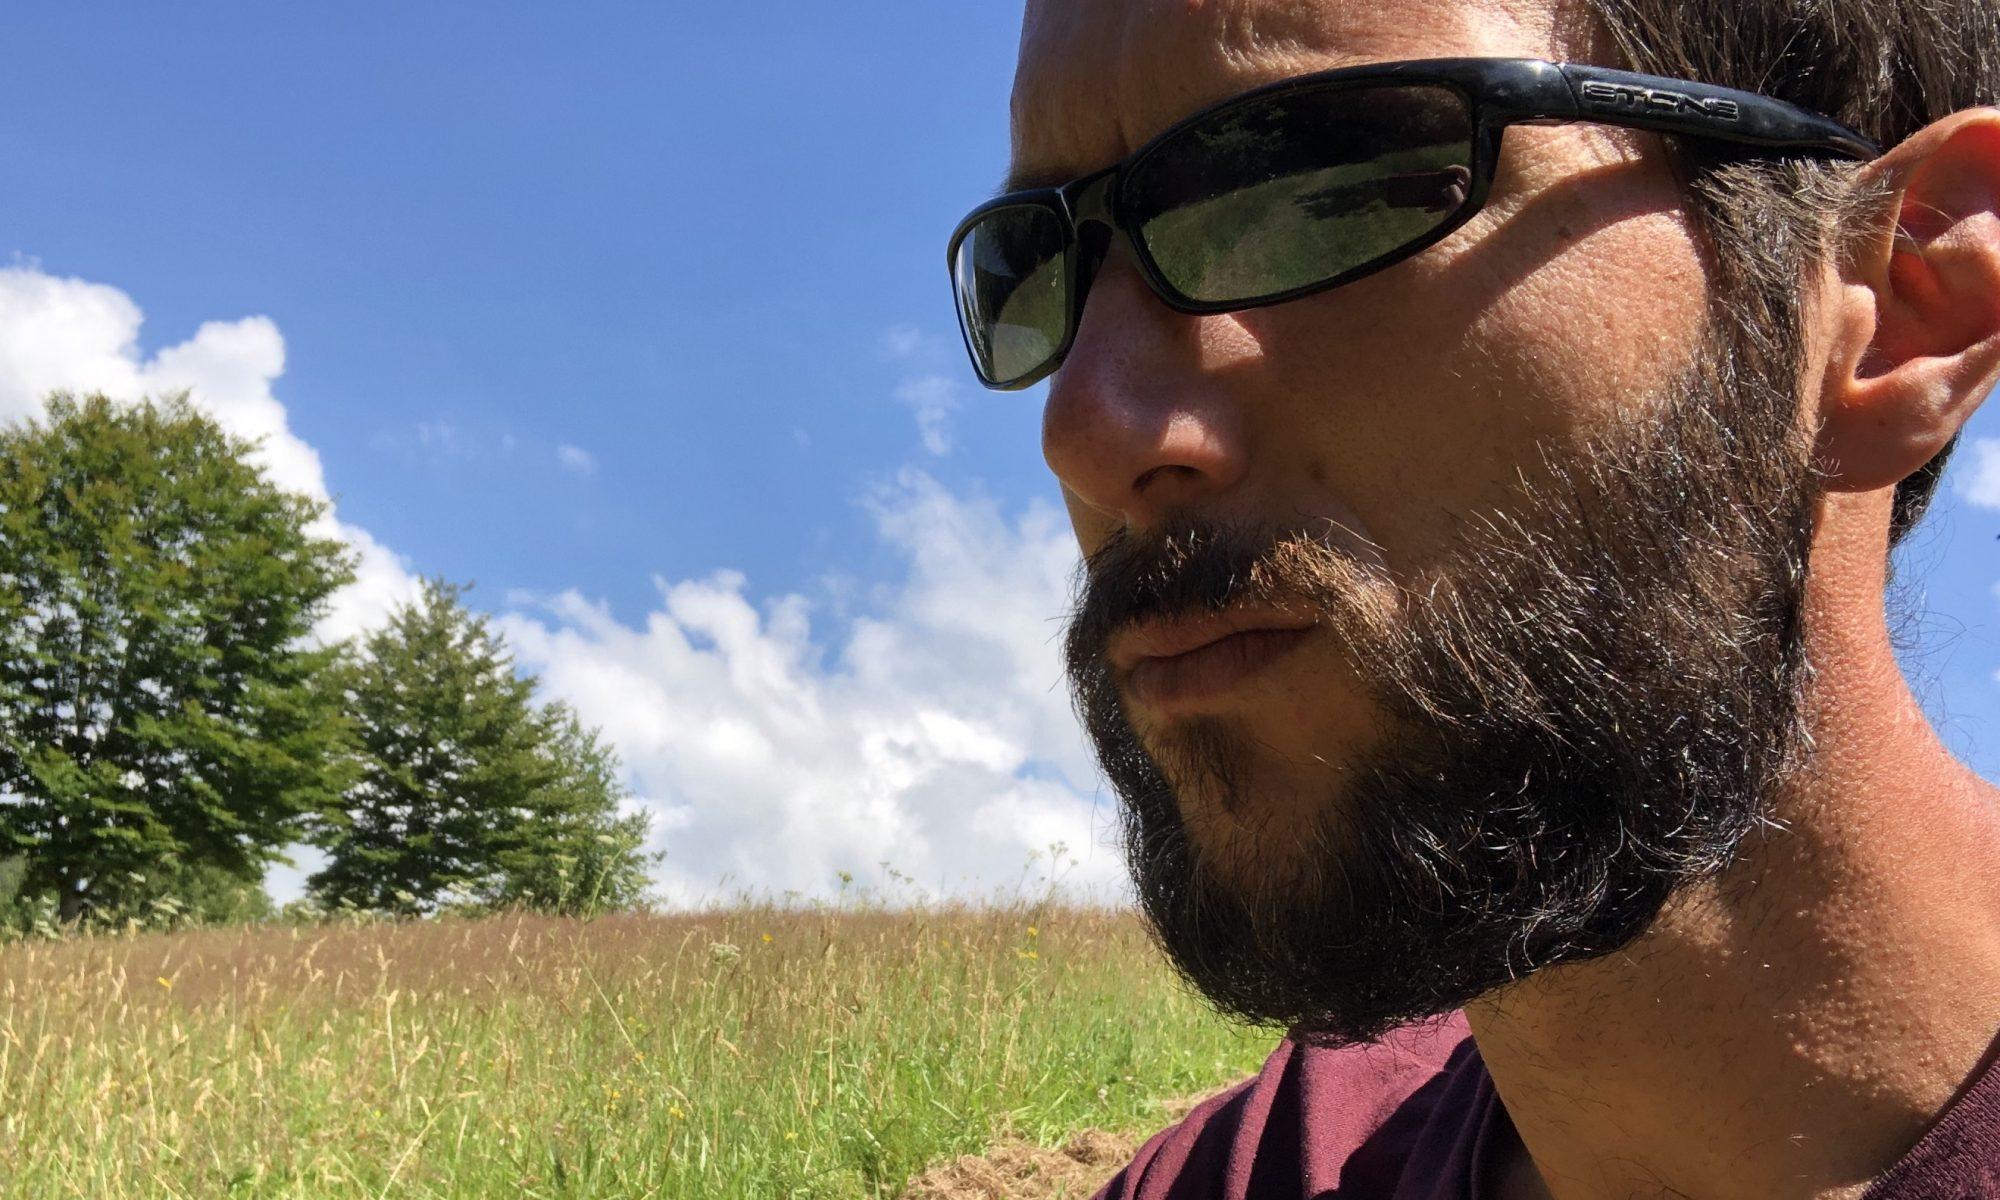 Your business idea is like growing a beard